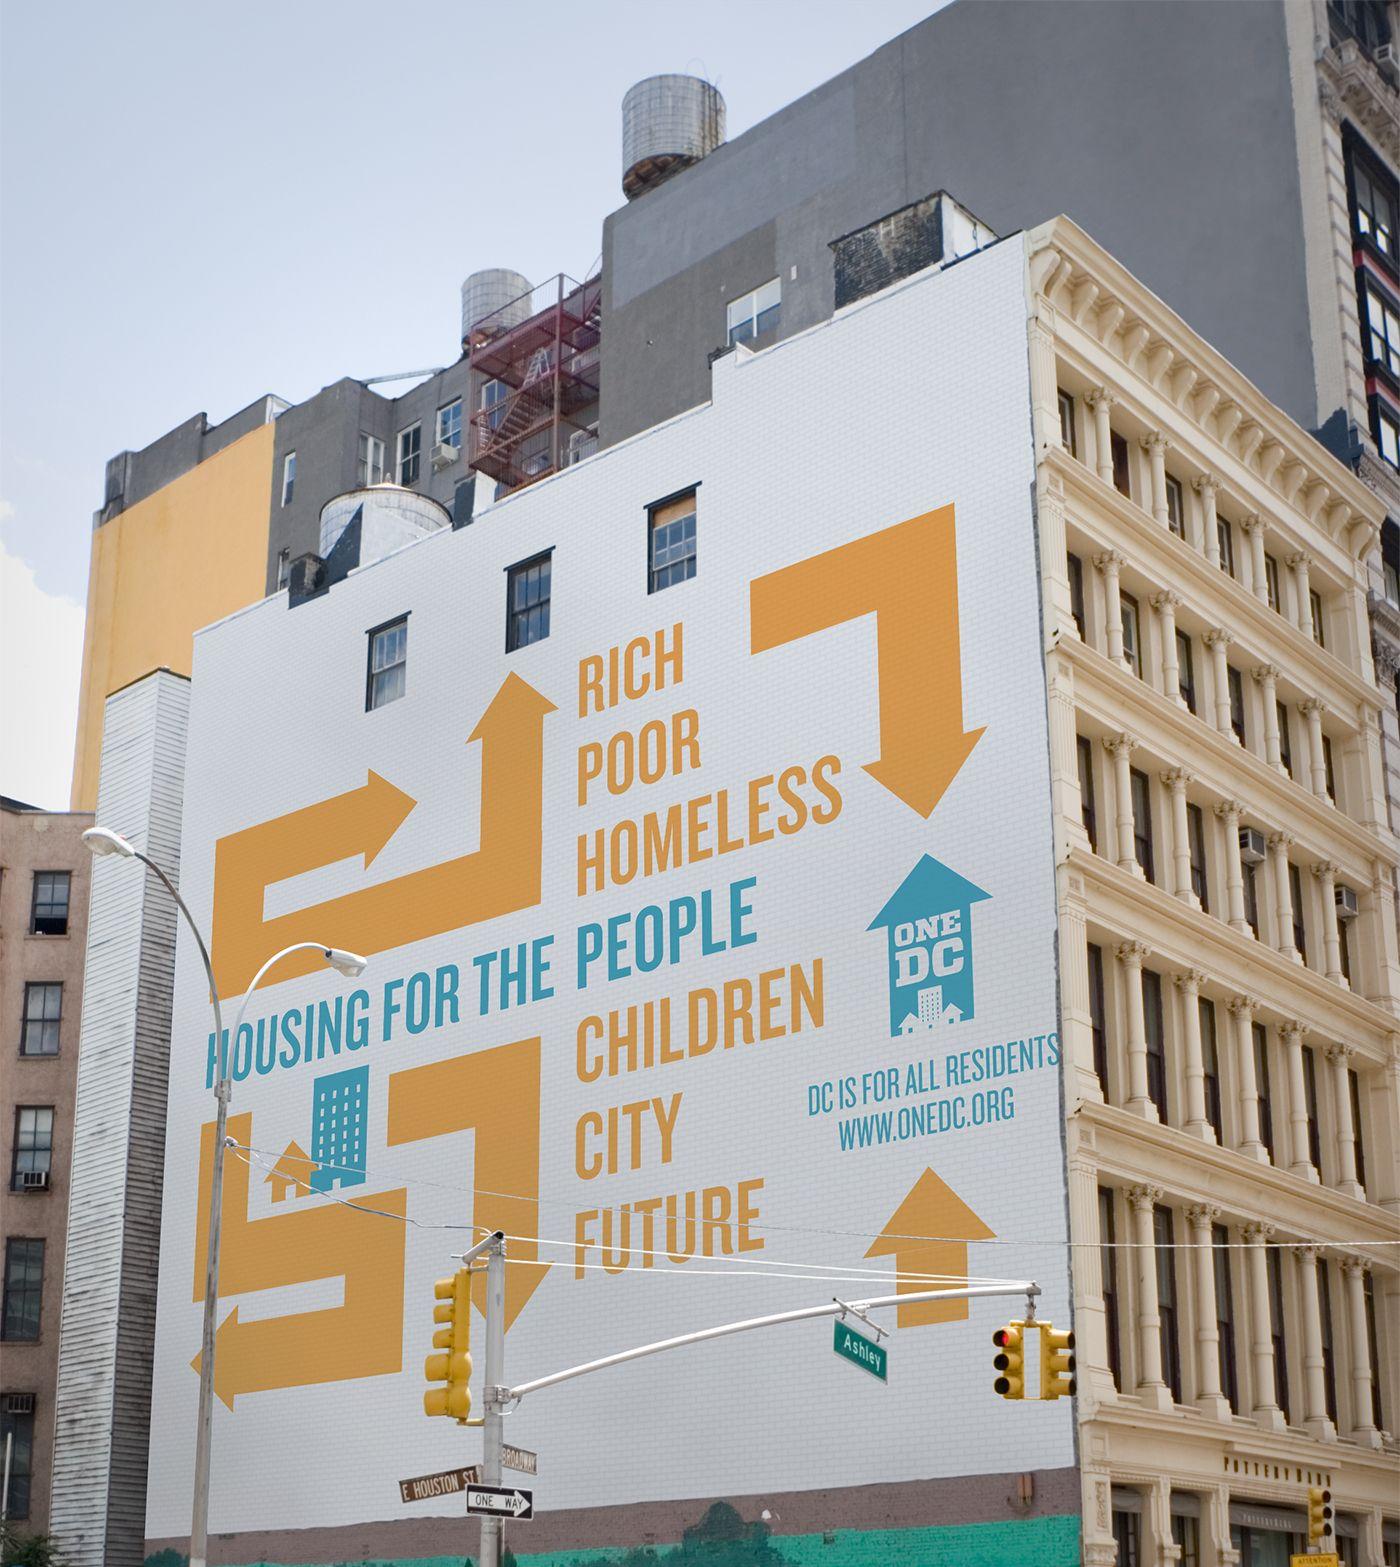 Alicia Coleman On Behance Homeless Housing City Property Development